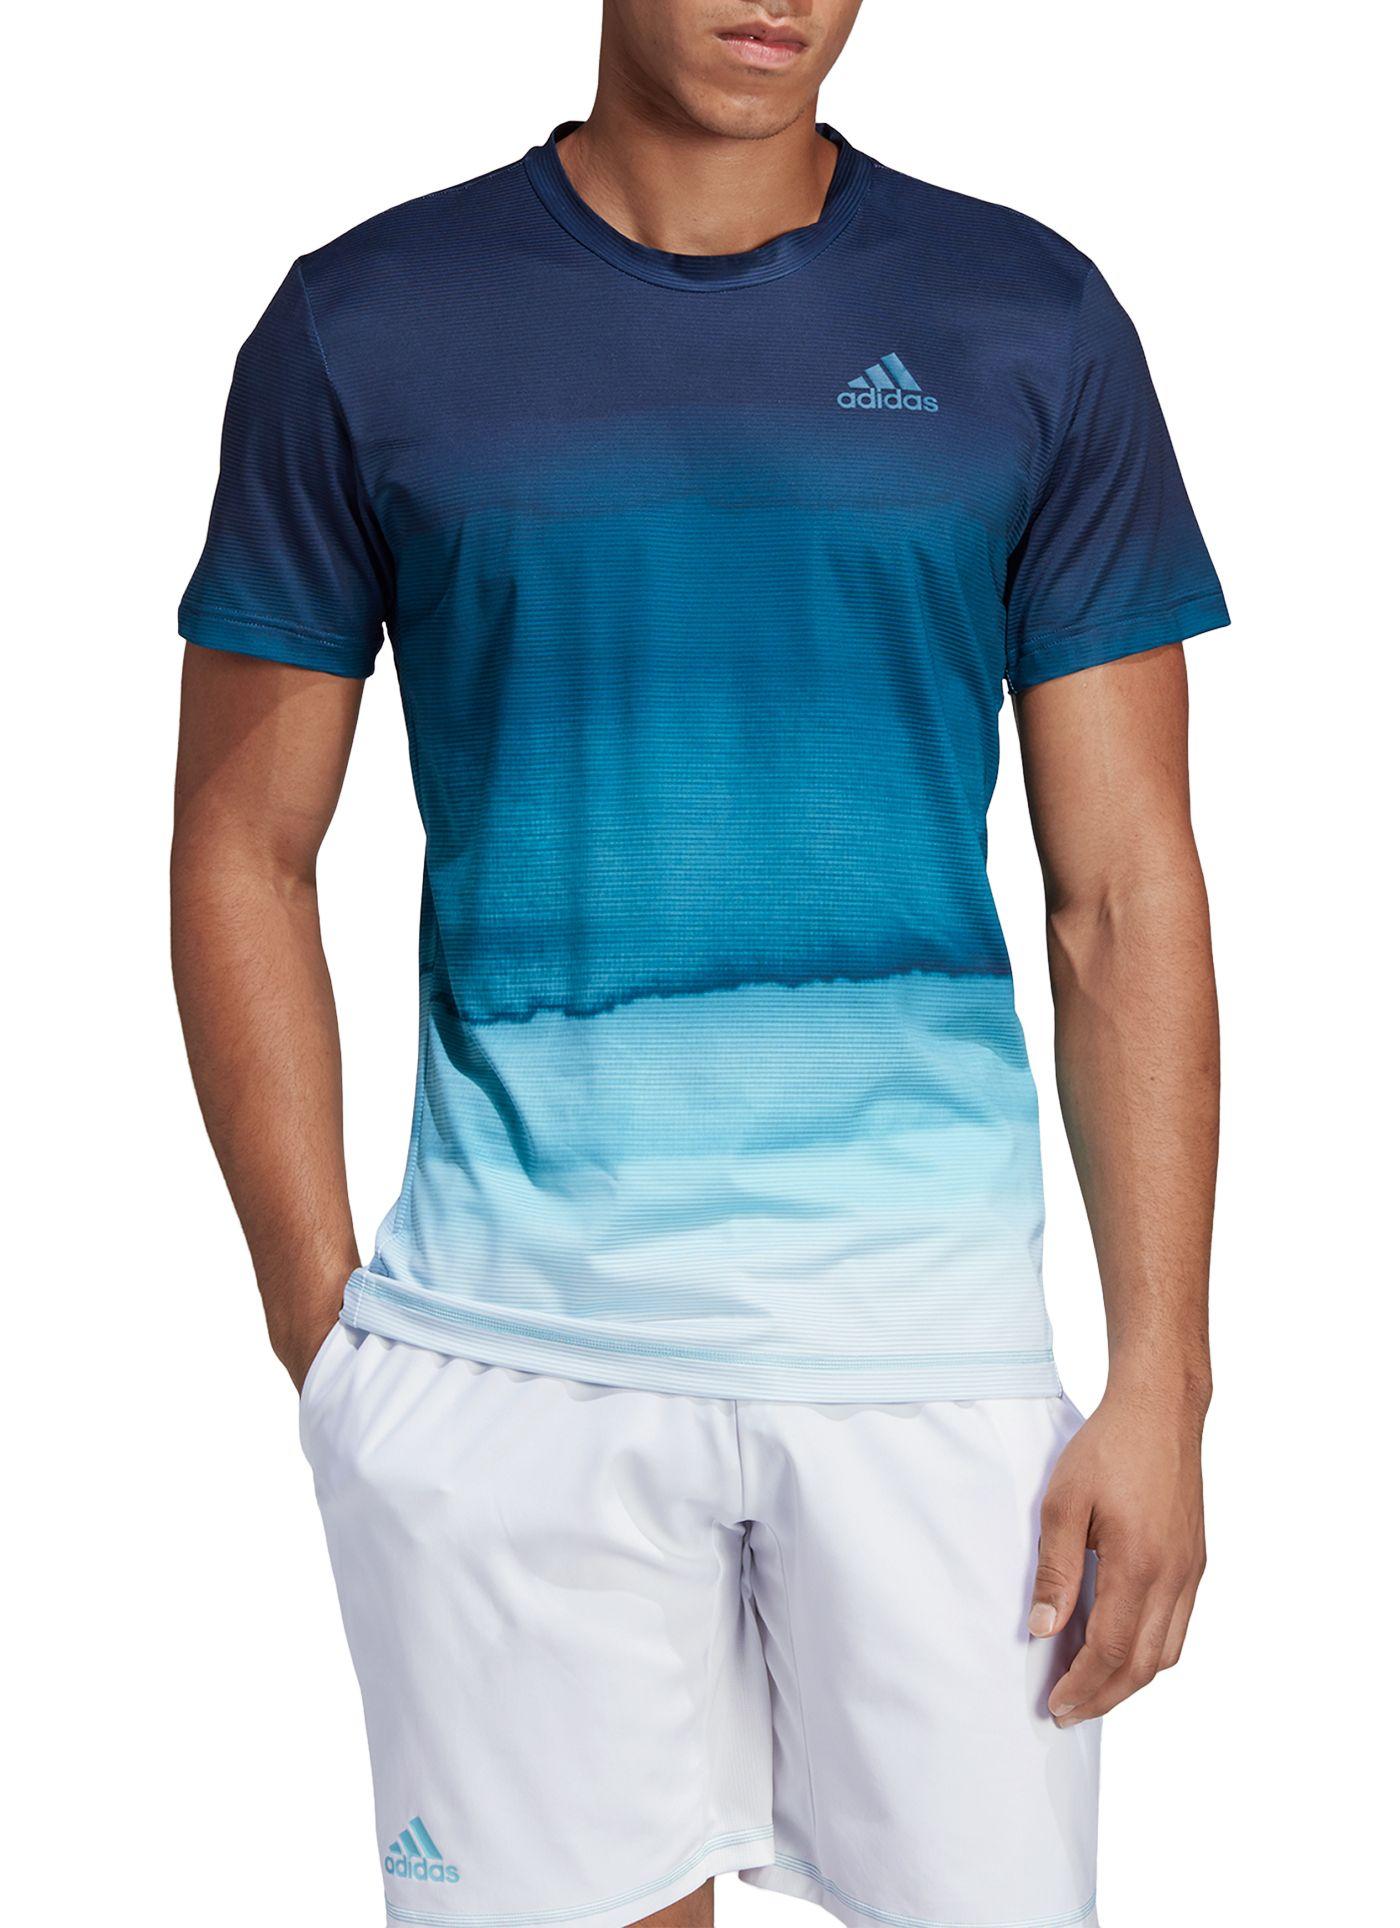 adidas Men's Parley Printed Tennis T-Shirt